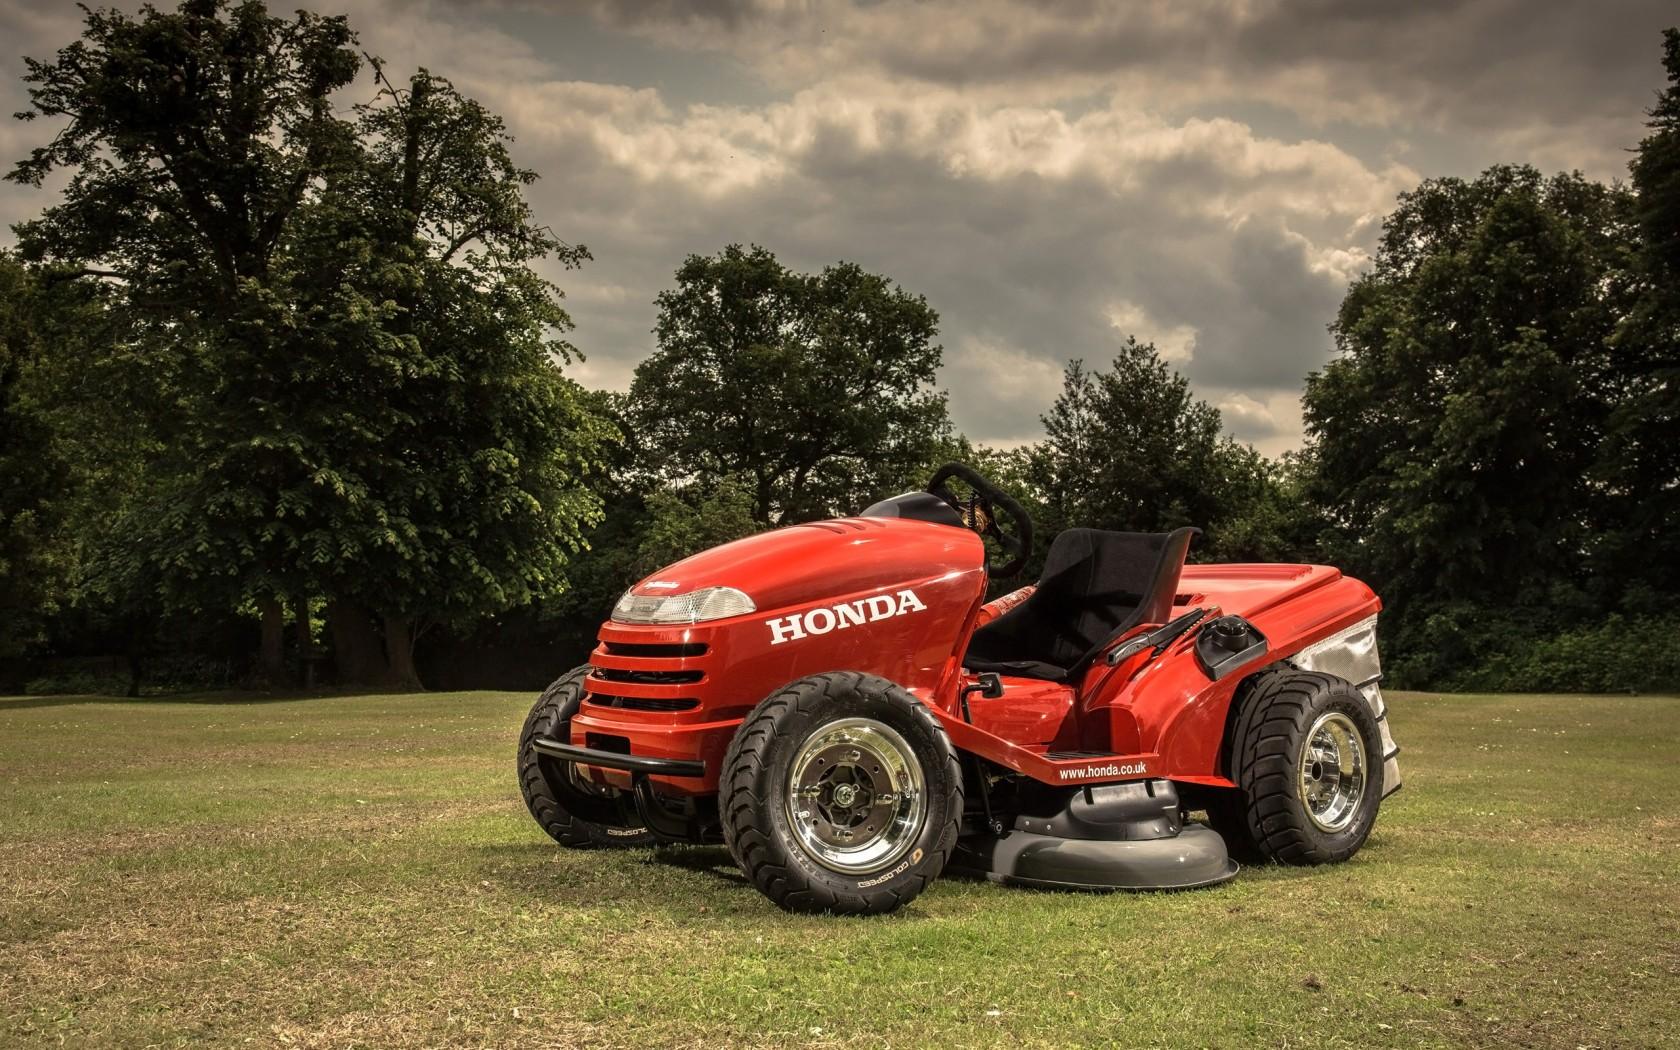 Honda Mean Mower X